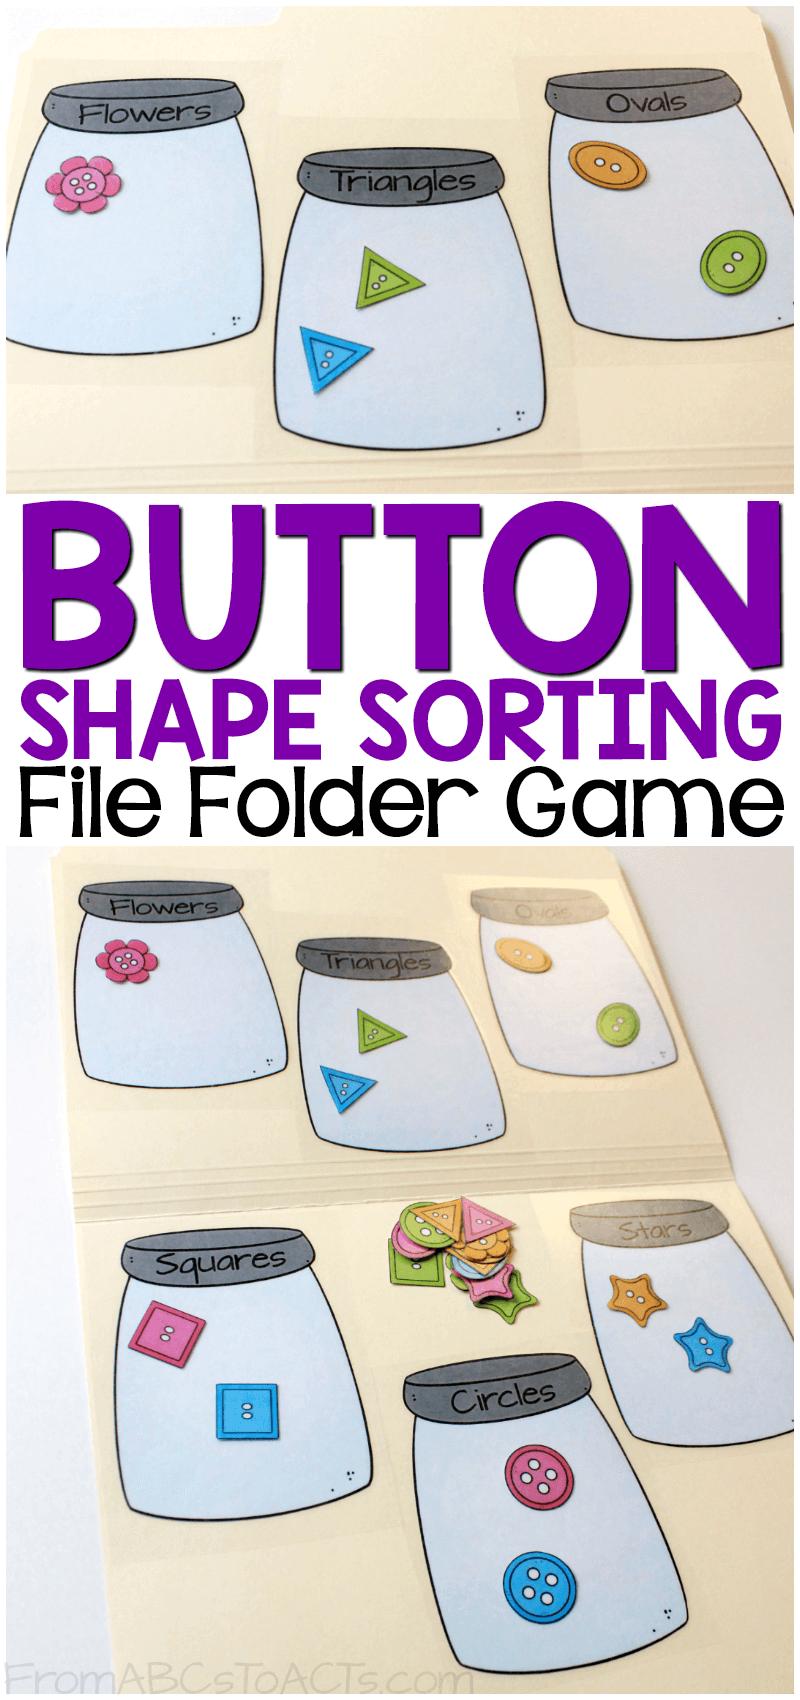 Button Shape Sorting Printable File Folder Game | Homeschool - Free Printable Math File Folder Games For Preschoolers